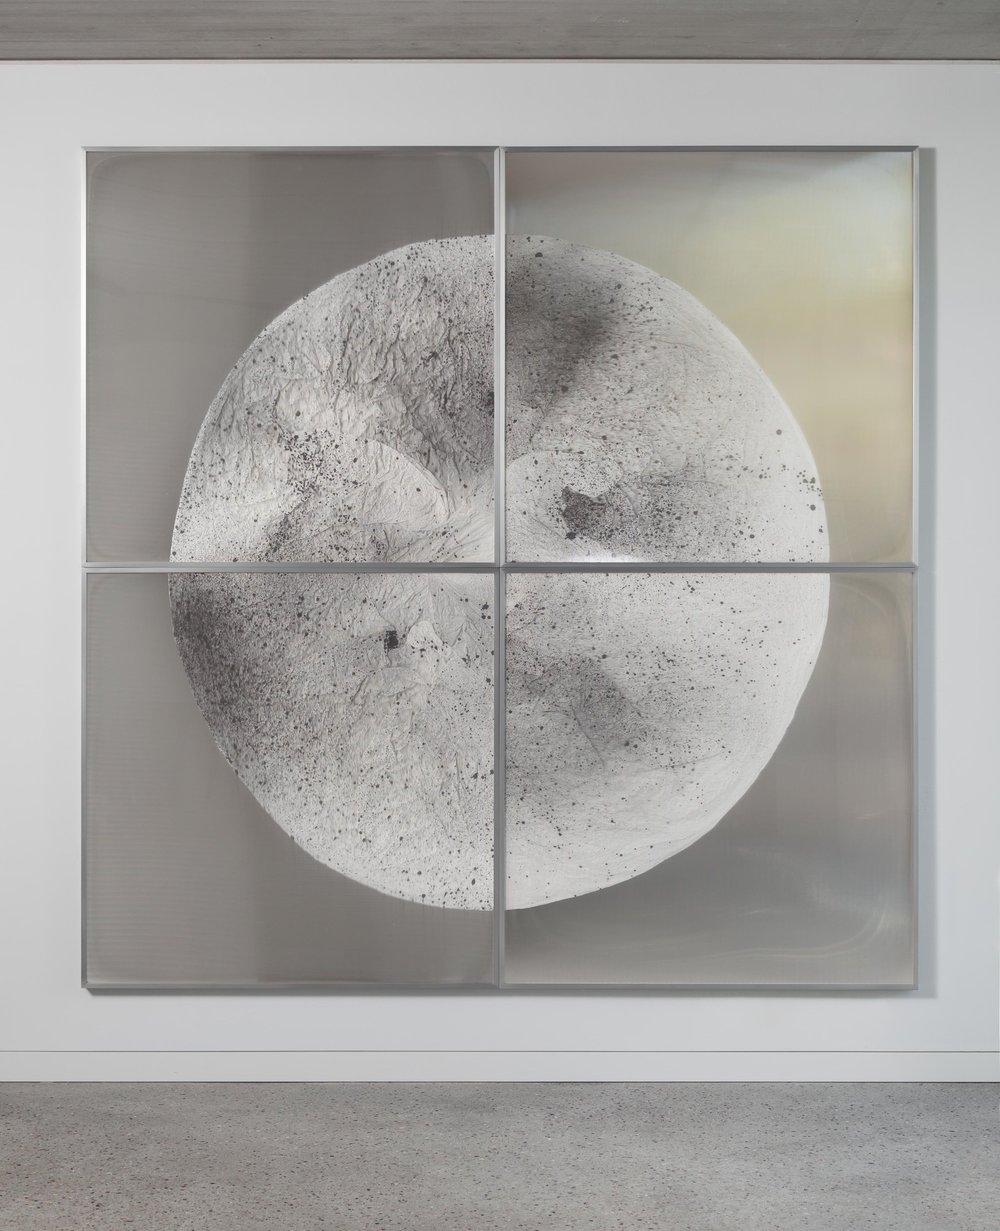 Verklärte Nacht (Transfigured Night) / Part VI (Quadriptych),  2018 - Installation view Ink on Xuan paper on mirror beneath linear Plexiglas, aluminium frame 240 x 240 cm (95 x 95 in)